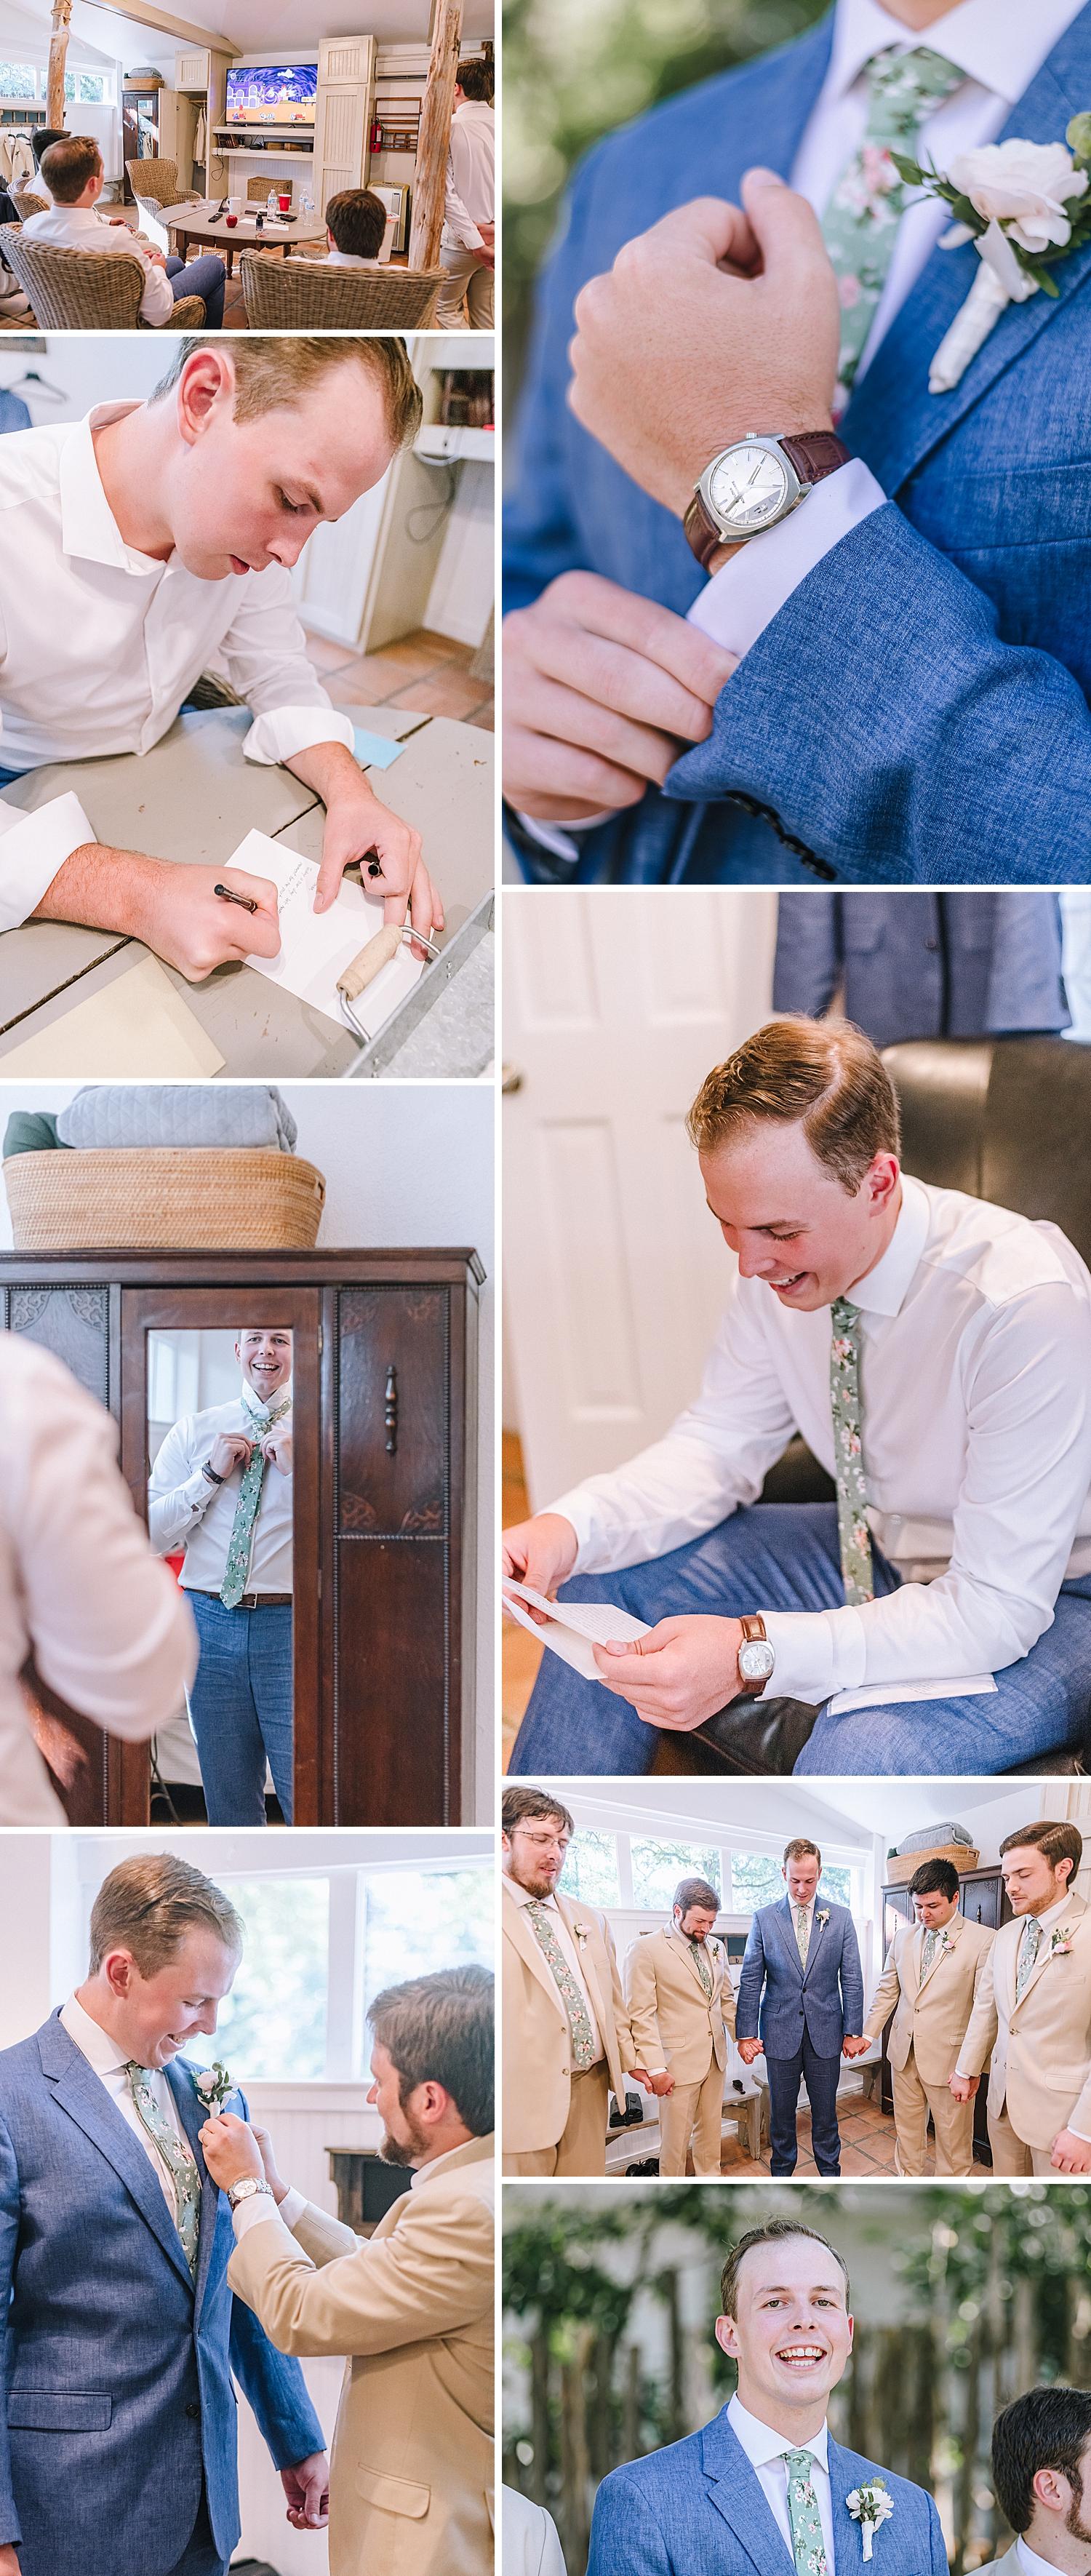 Gruene-Estate-Wedding-New-Braunfels-Bride-Wedding-Photos-Carly-Barton-Photography_0079.jpg